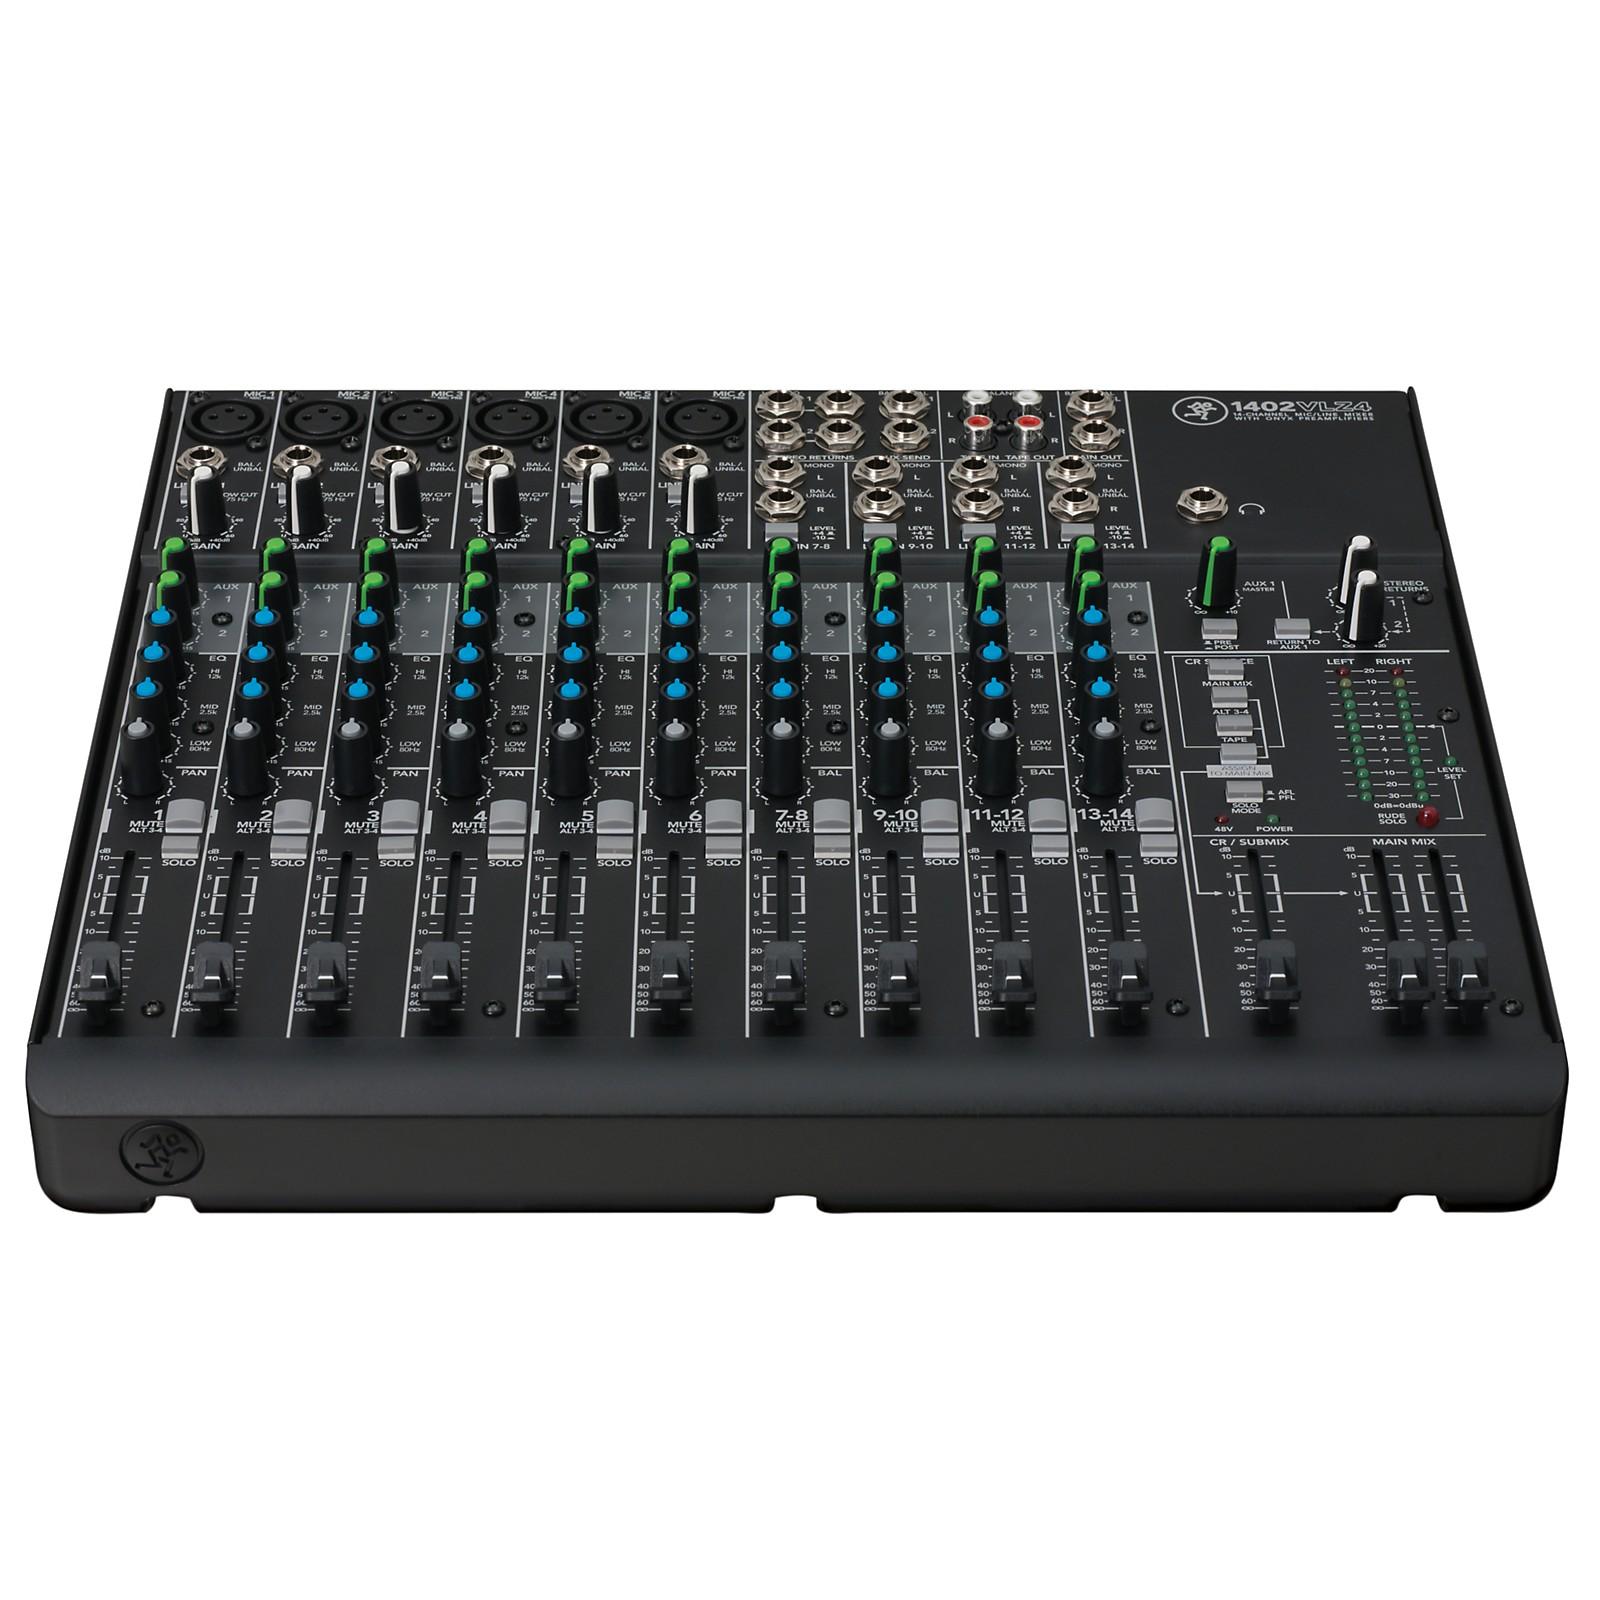 Mackie VLZ4 Series 1402VLZ4 14-Channel Compact Mixer